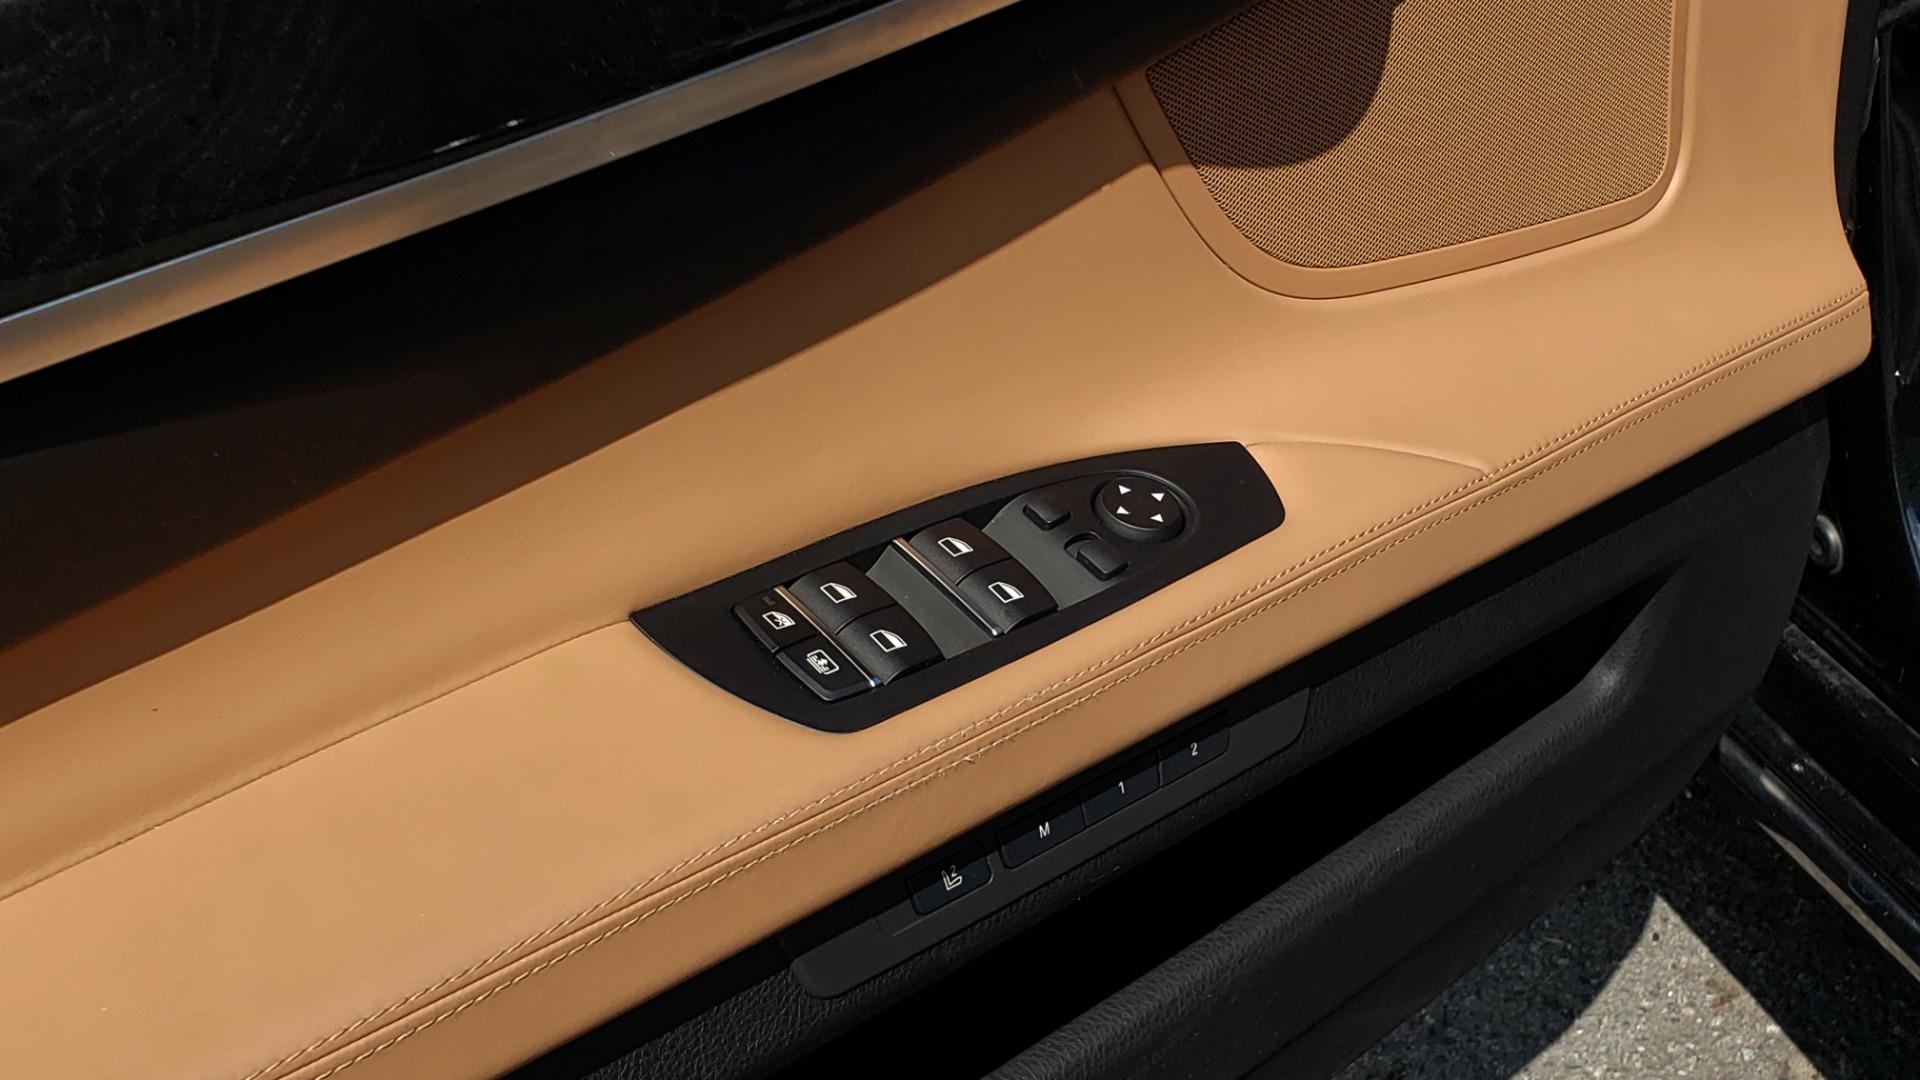 Used 2014 BMW 7 SERIES 750LI M-SPORT / EXEC PKG / DRVR ASST / LIGHTING / NAV / SUNROOF for sale Sold at Formula Imports in Charlotte NC 28227 30